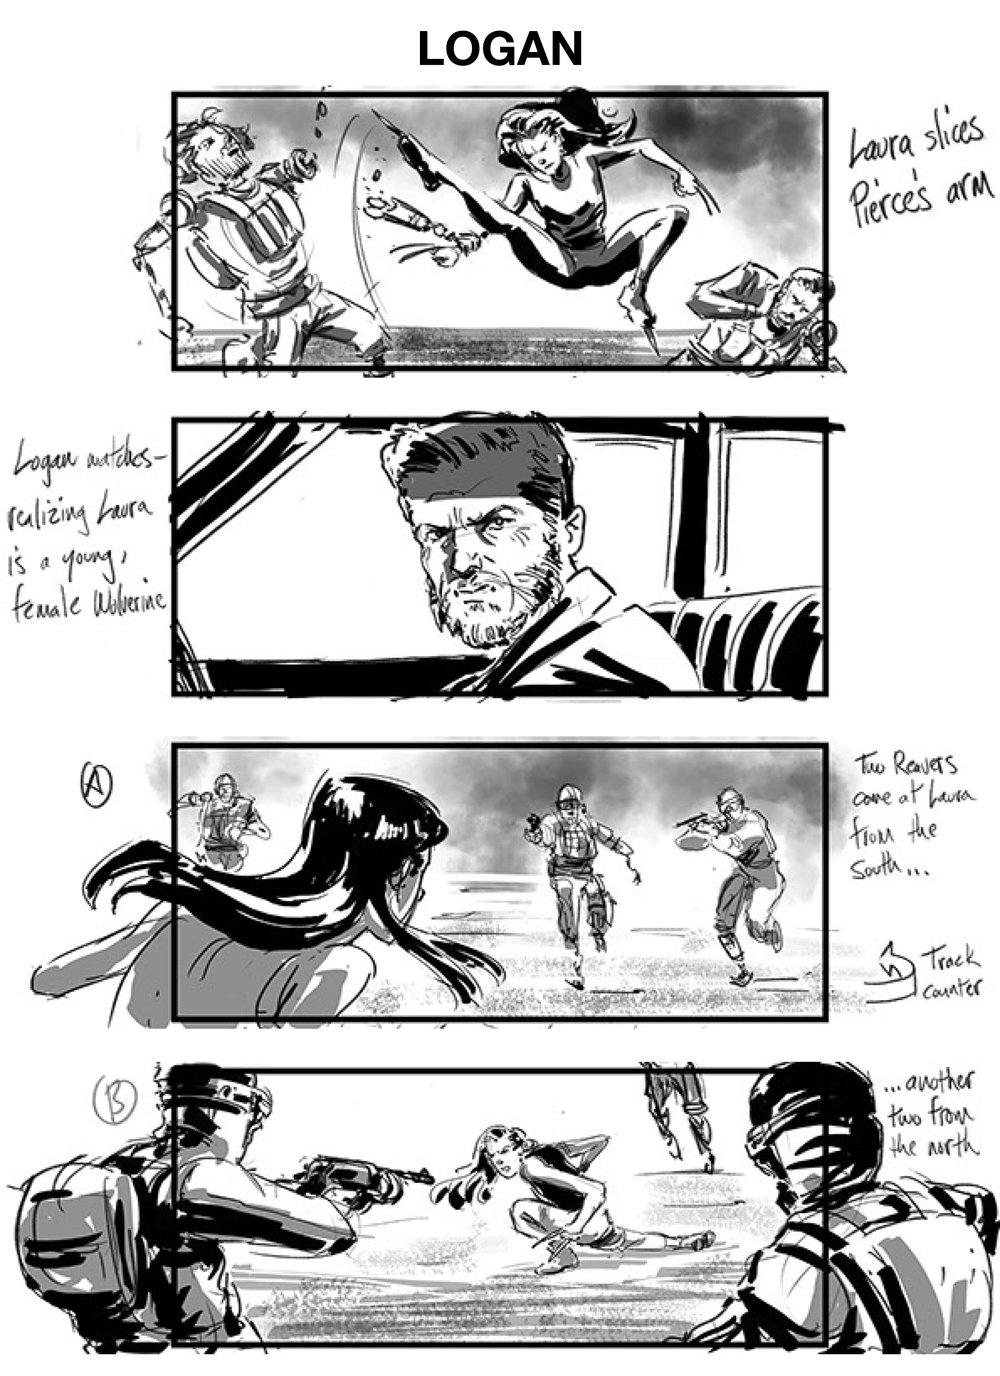 Logan web-05.jpg